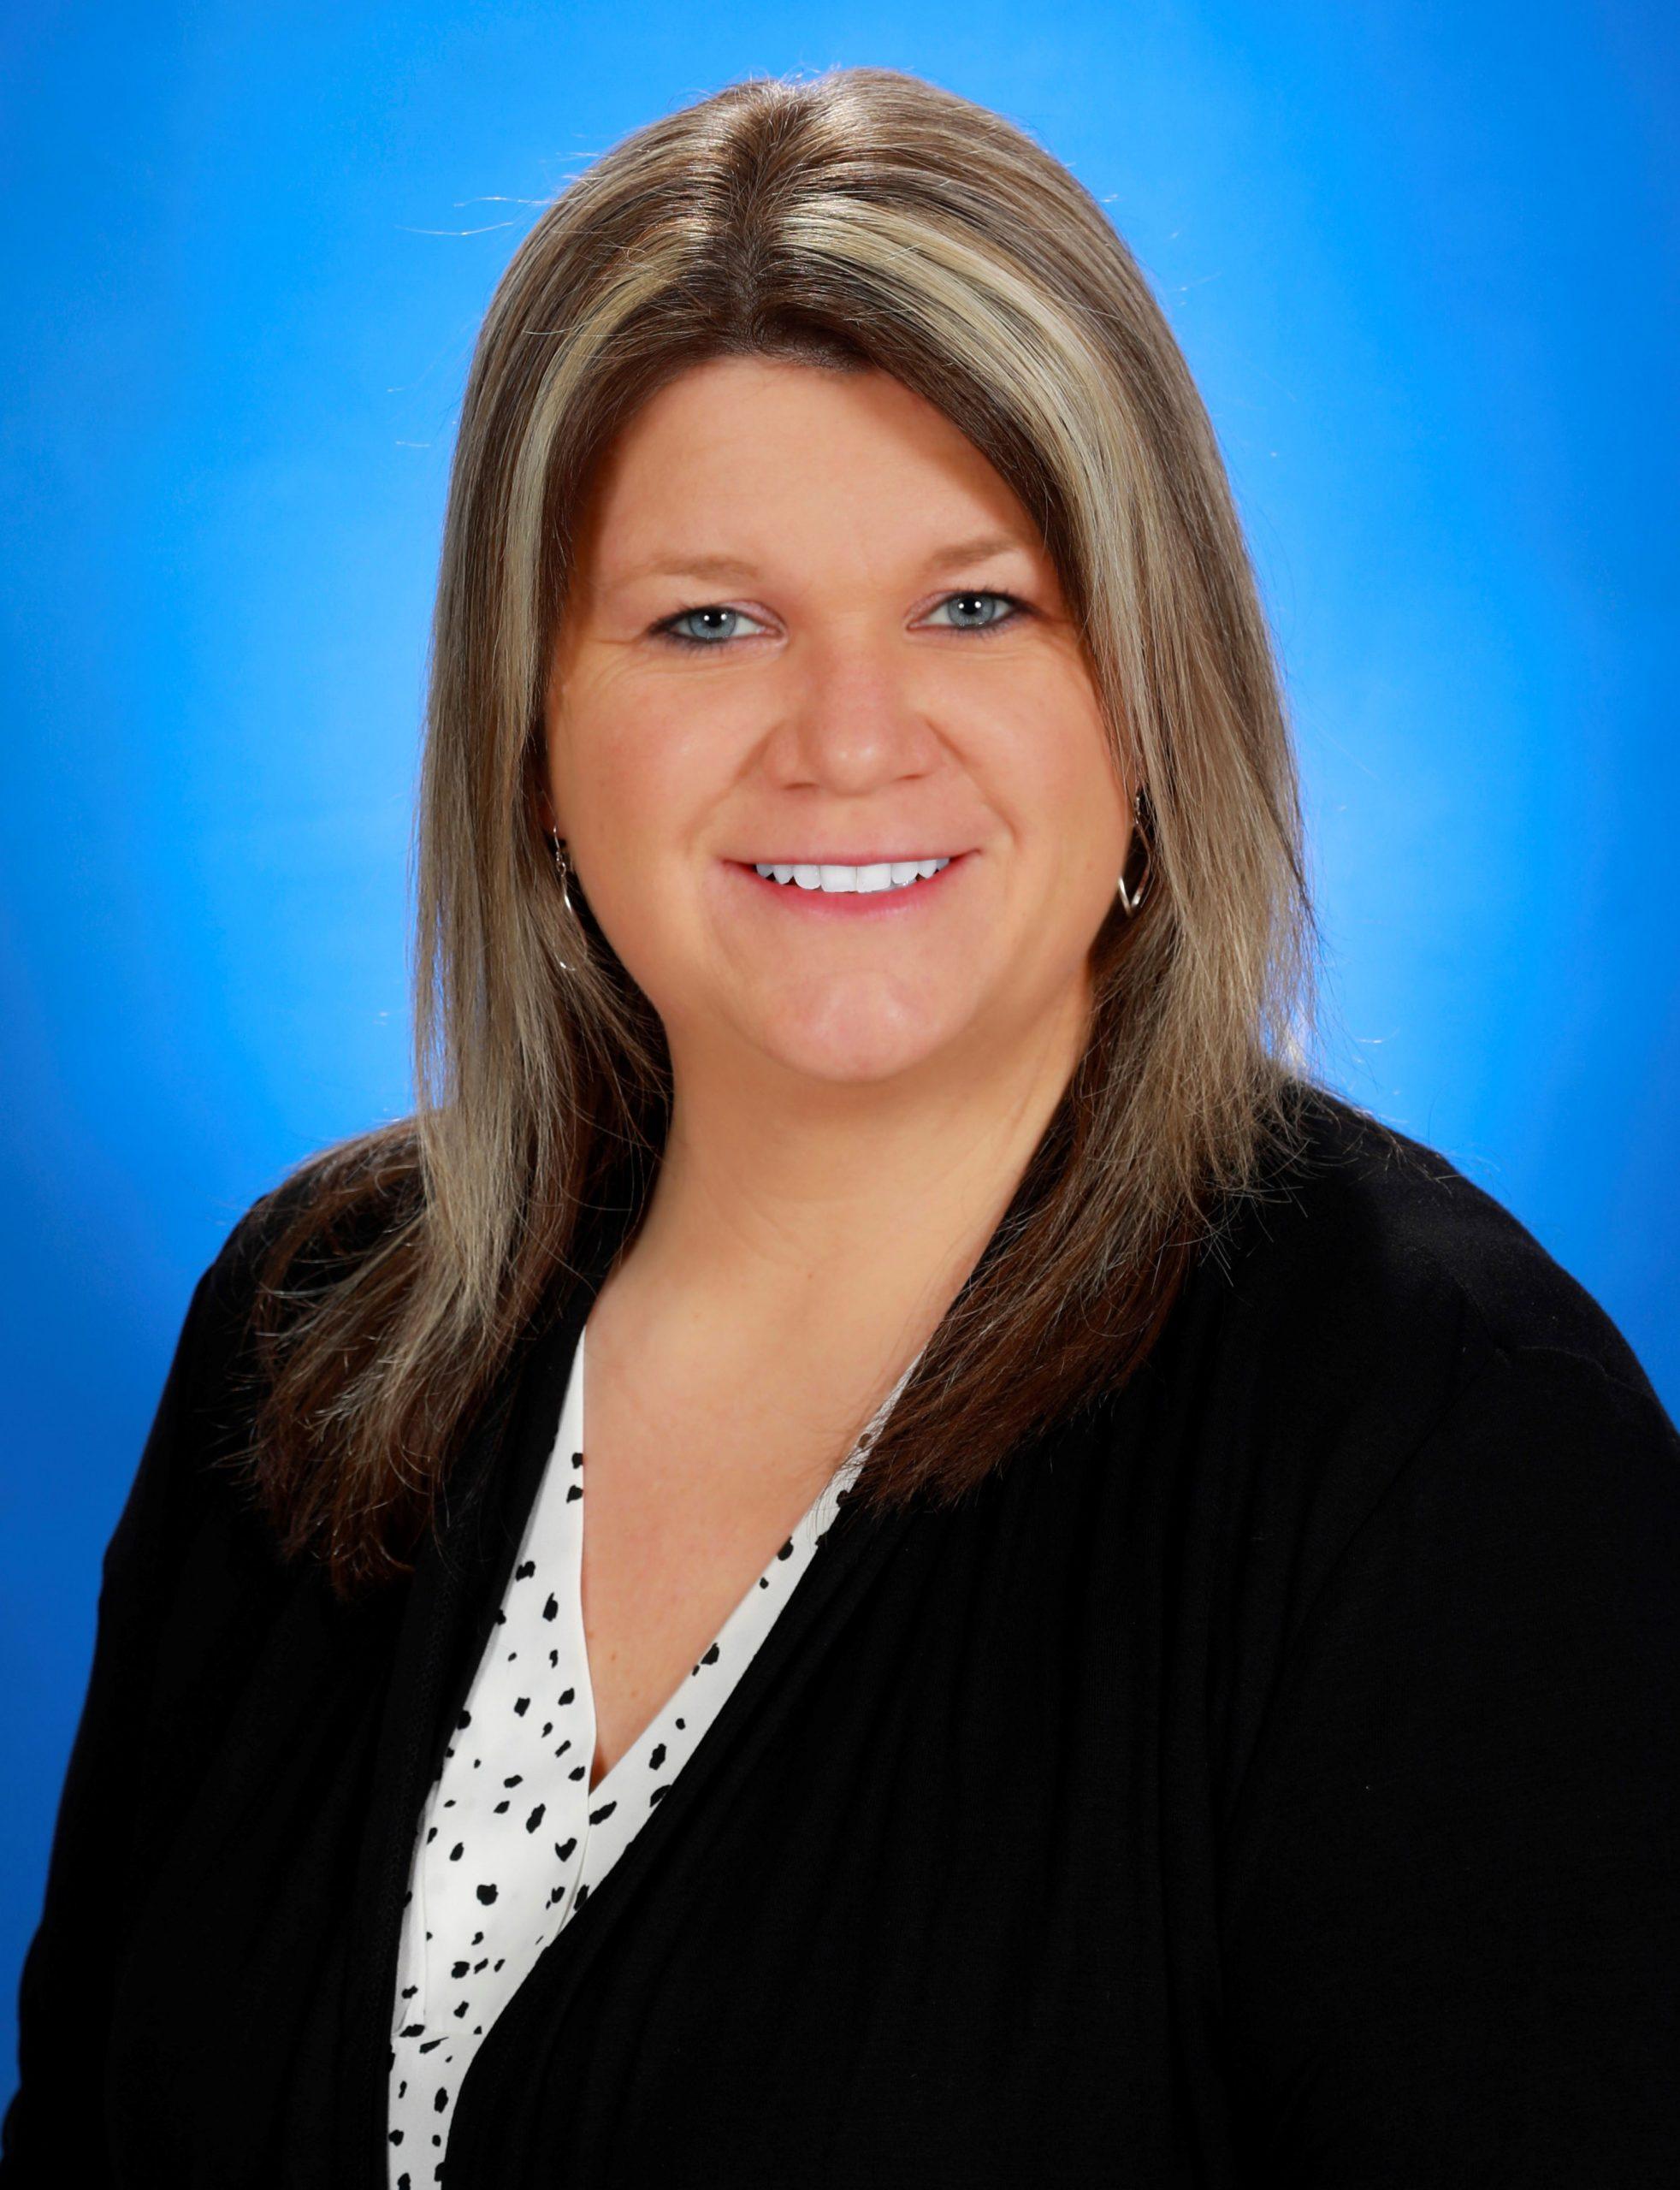 Stephanie Nanney, BSN, RN